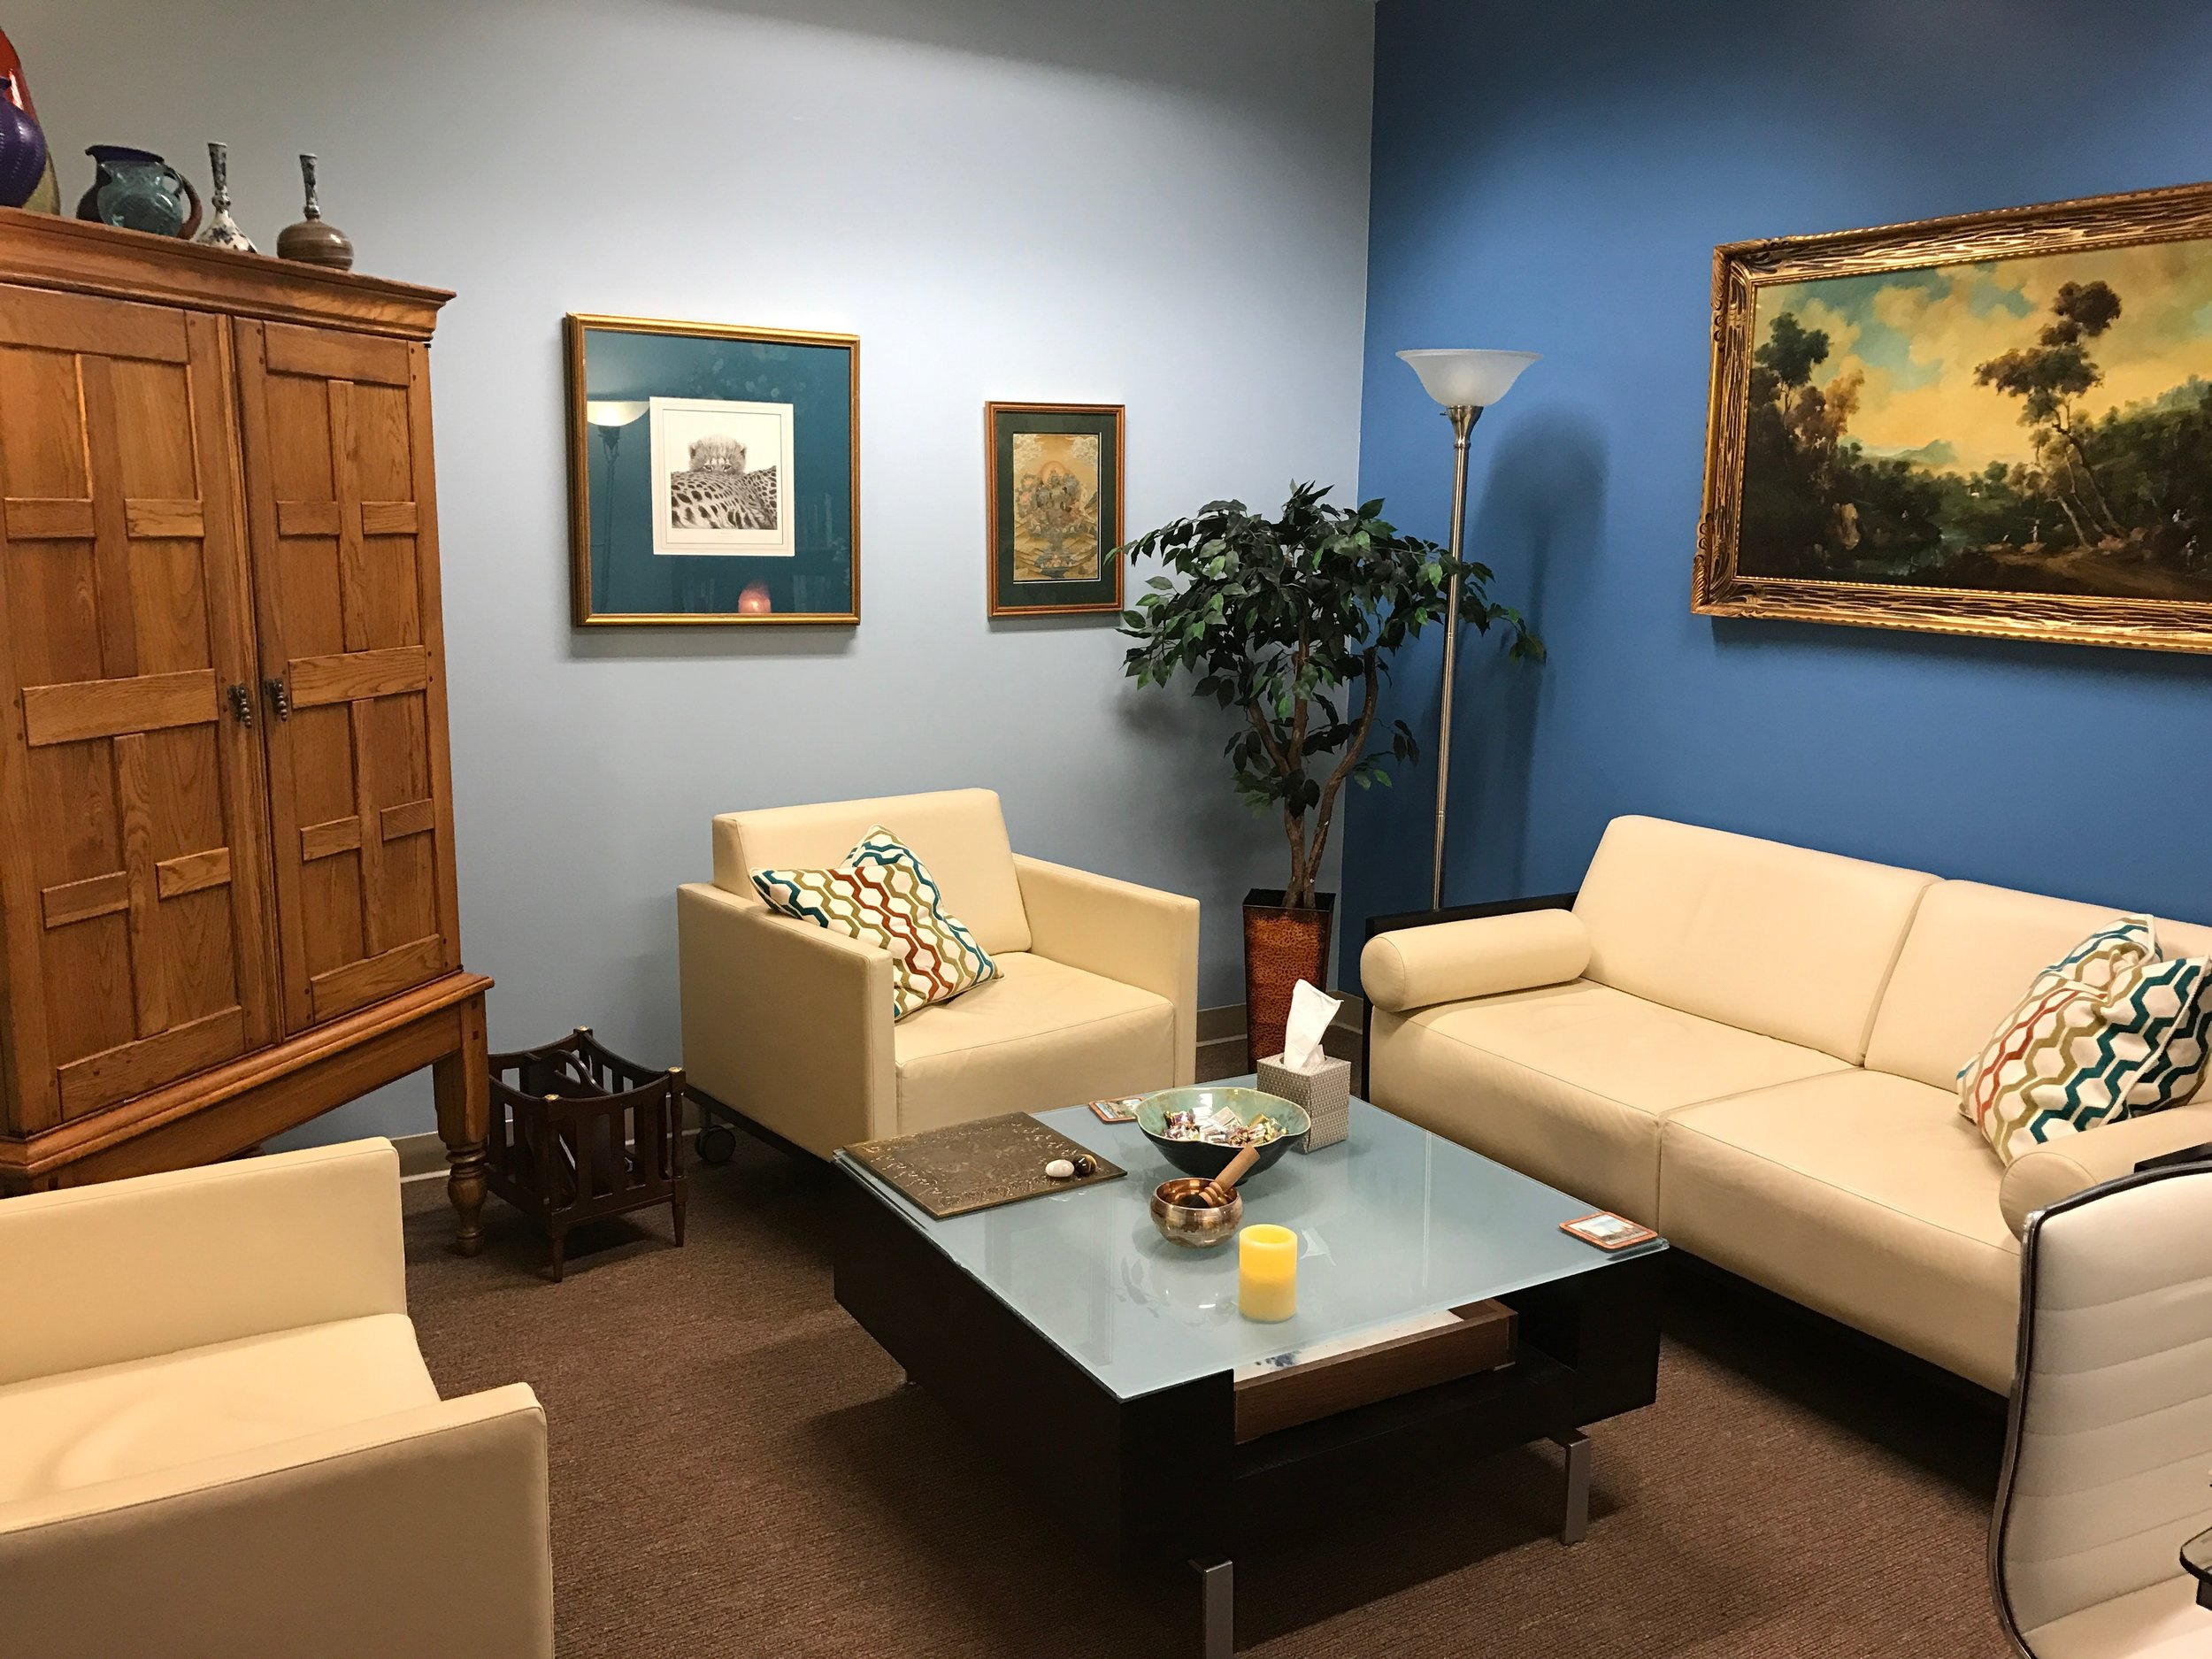 Dr. Ceres Artico's Office